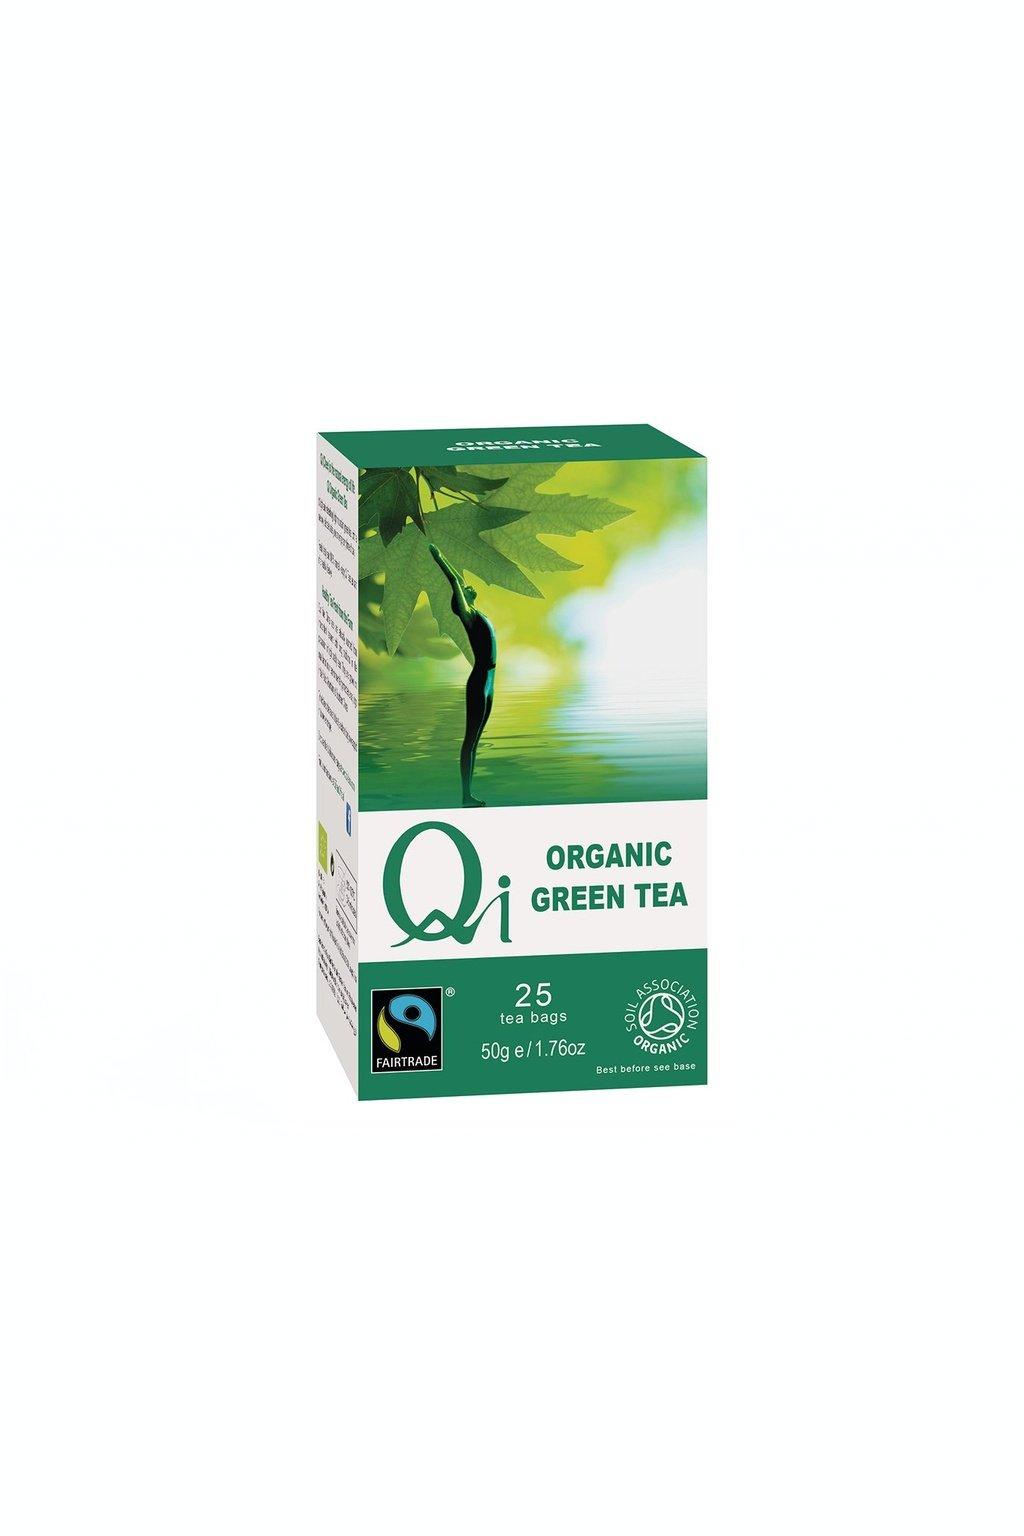 SAMAY Qi Teas BIO Fairtrade zeleny caj